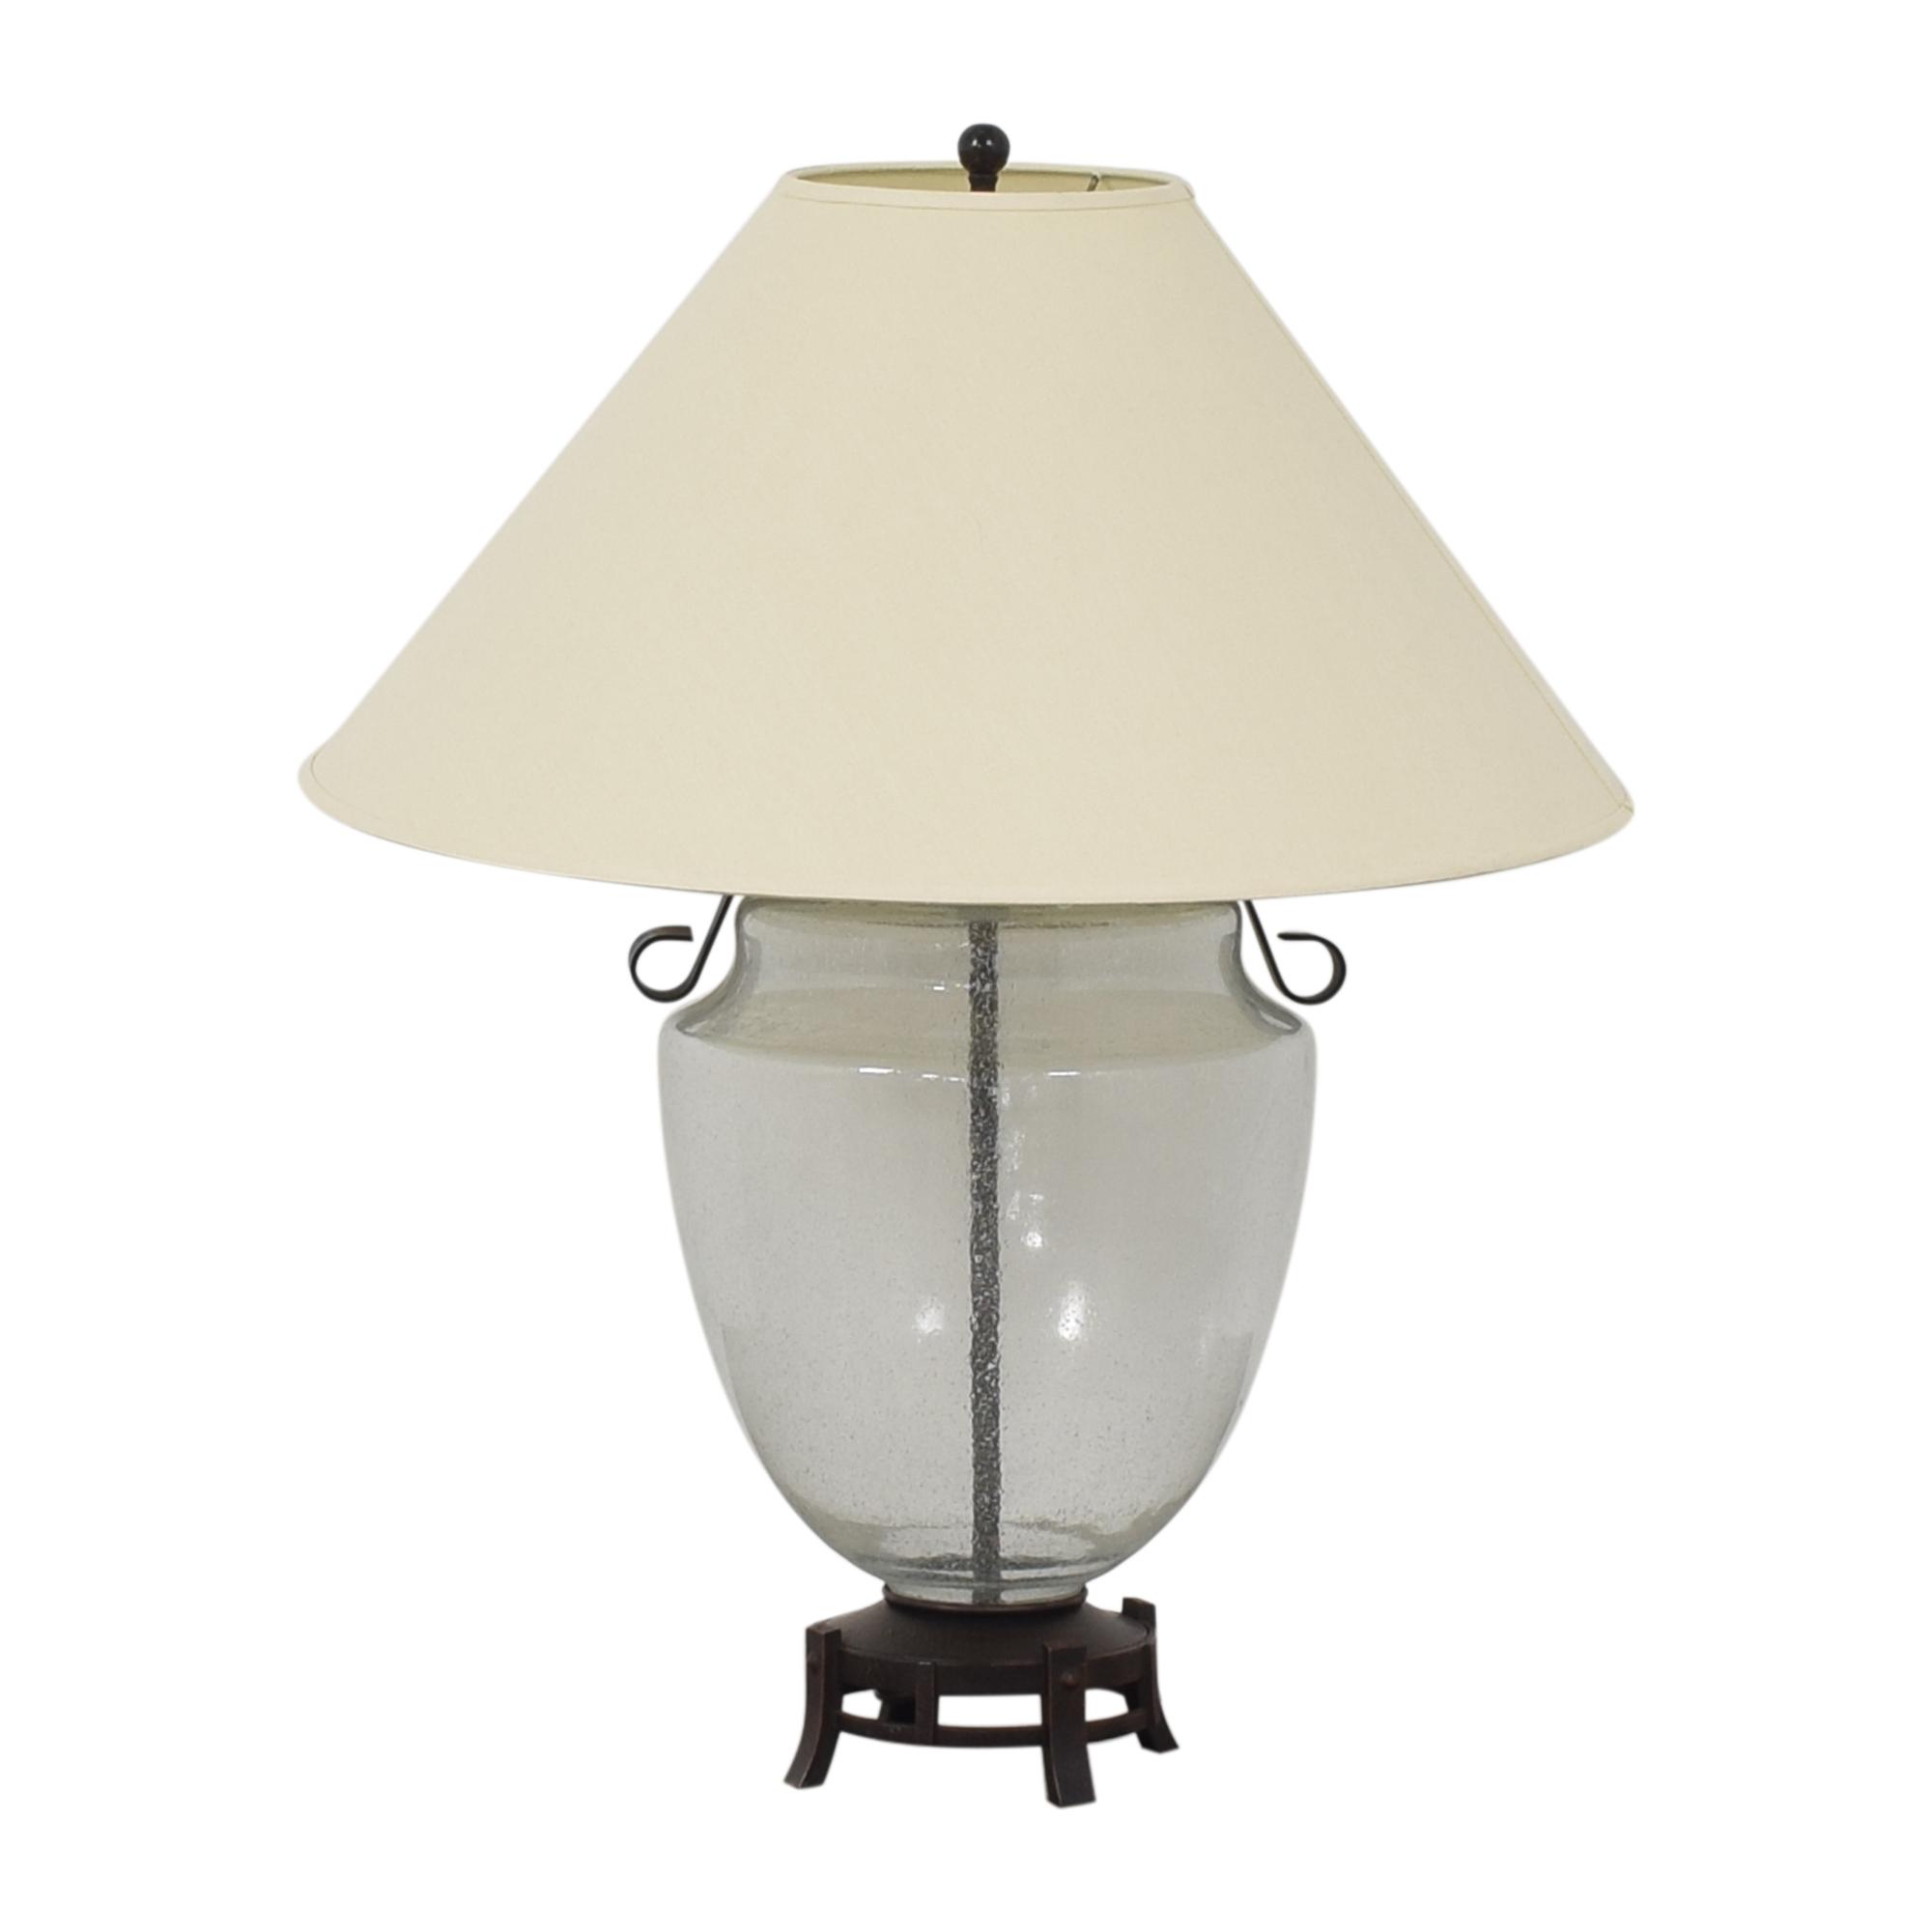 Ethan Allen Ethan Allen Modern Table Lamp Decor